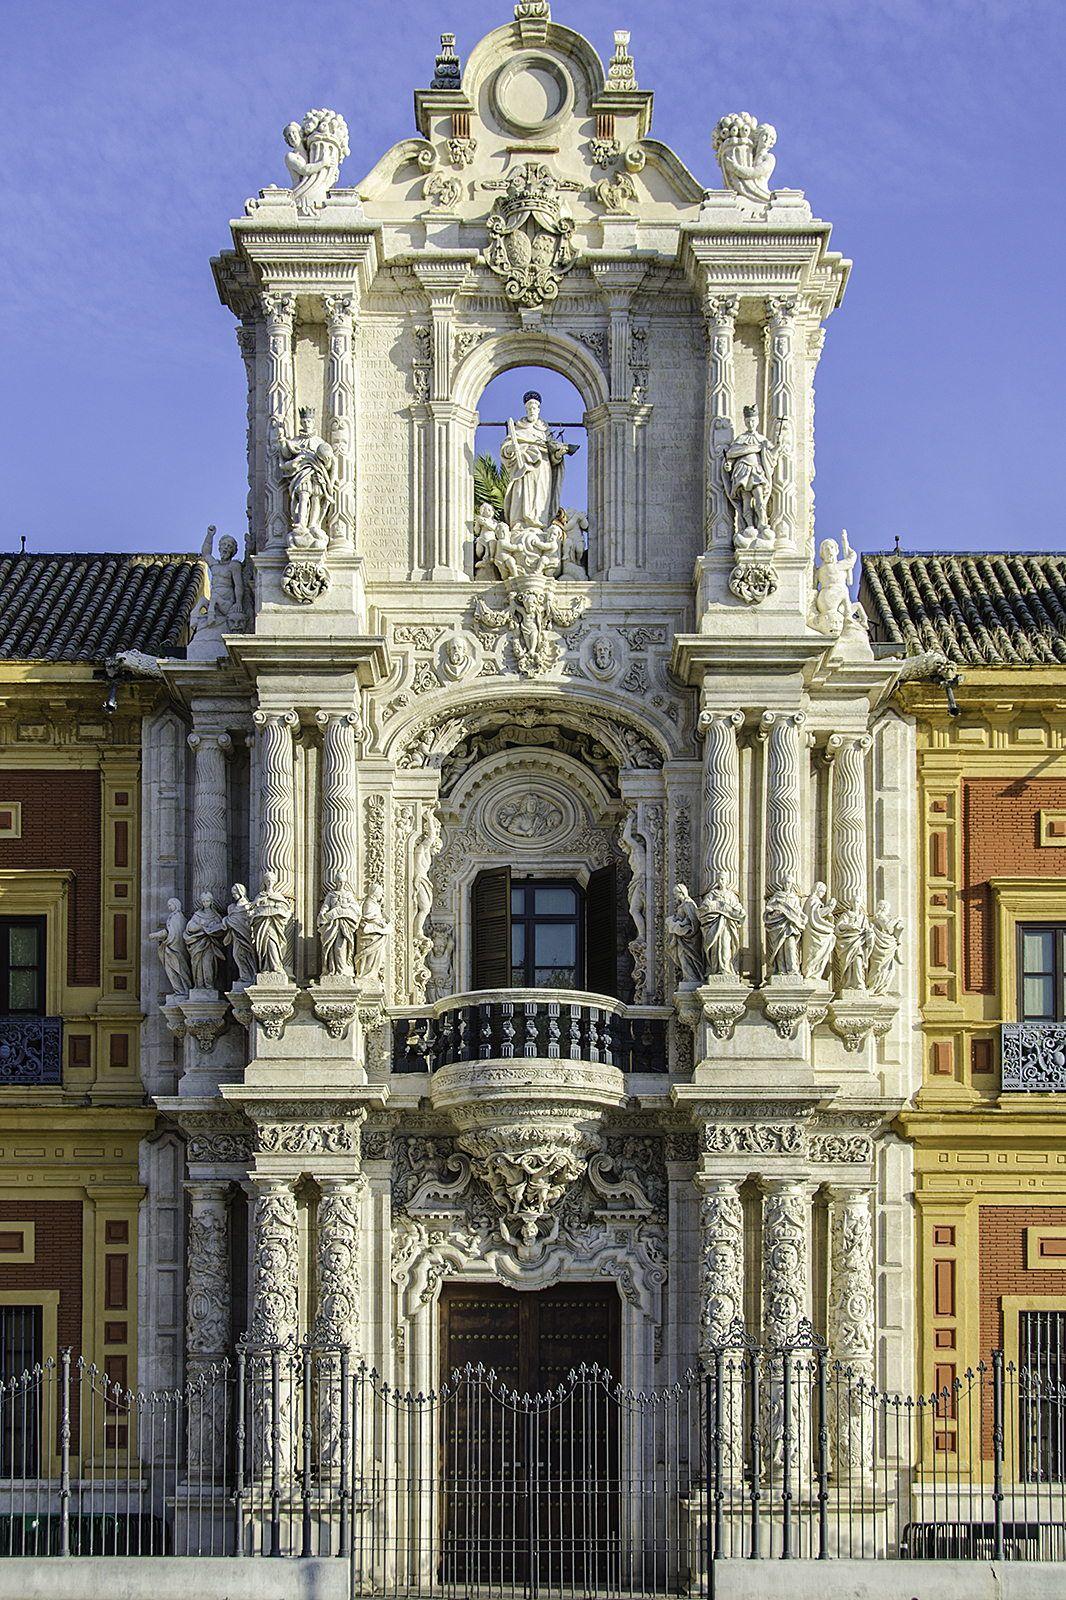 Sevilla palacio de san telmo fachada barroca by alfonso for Architecture baroque